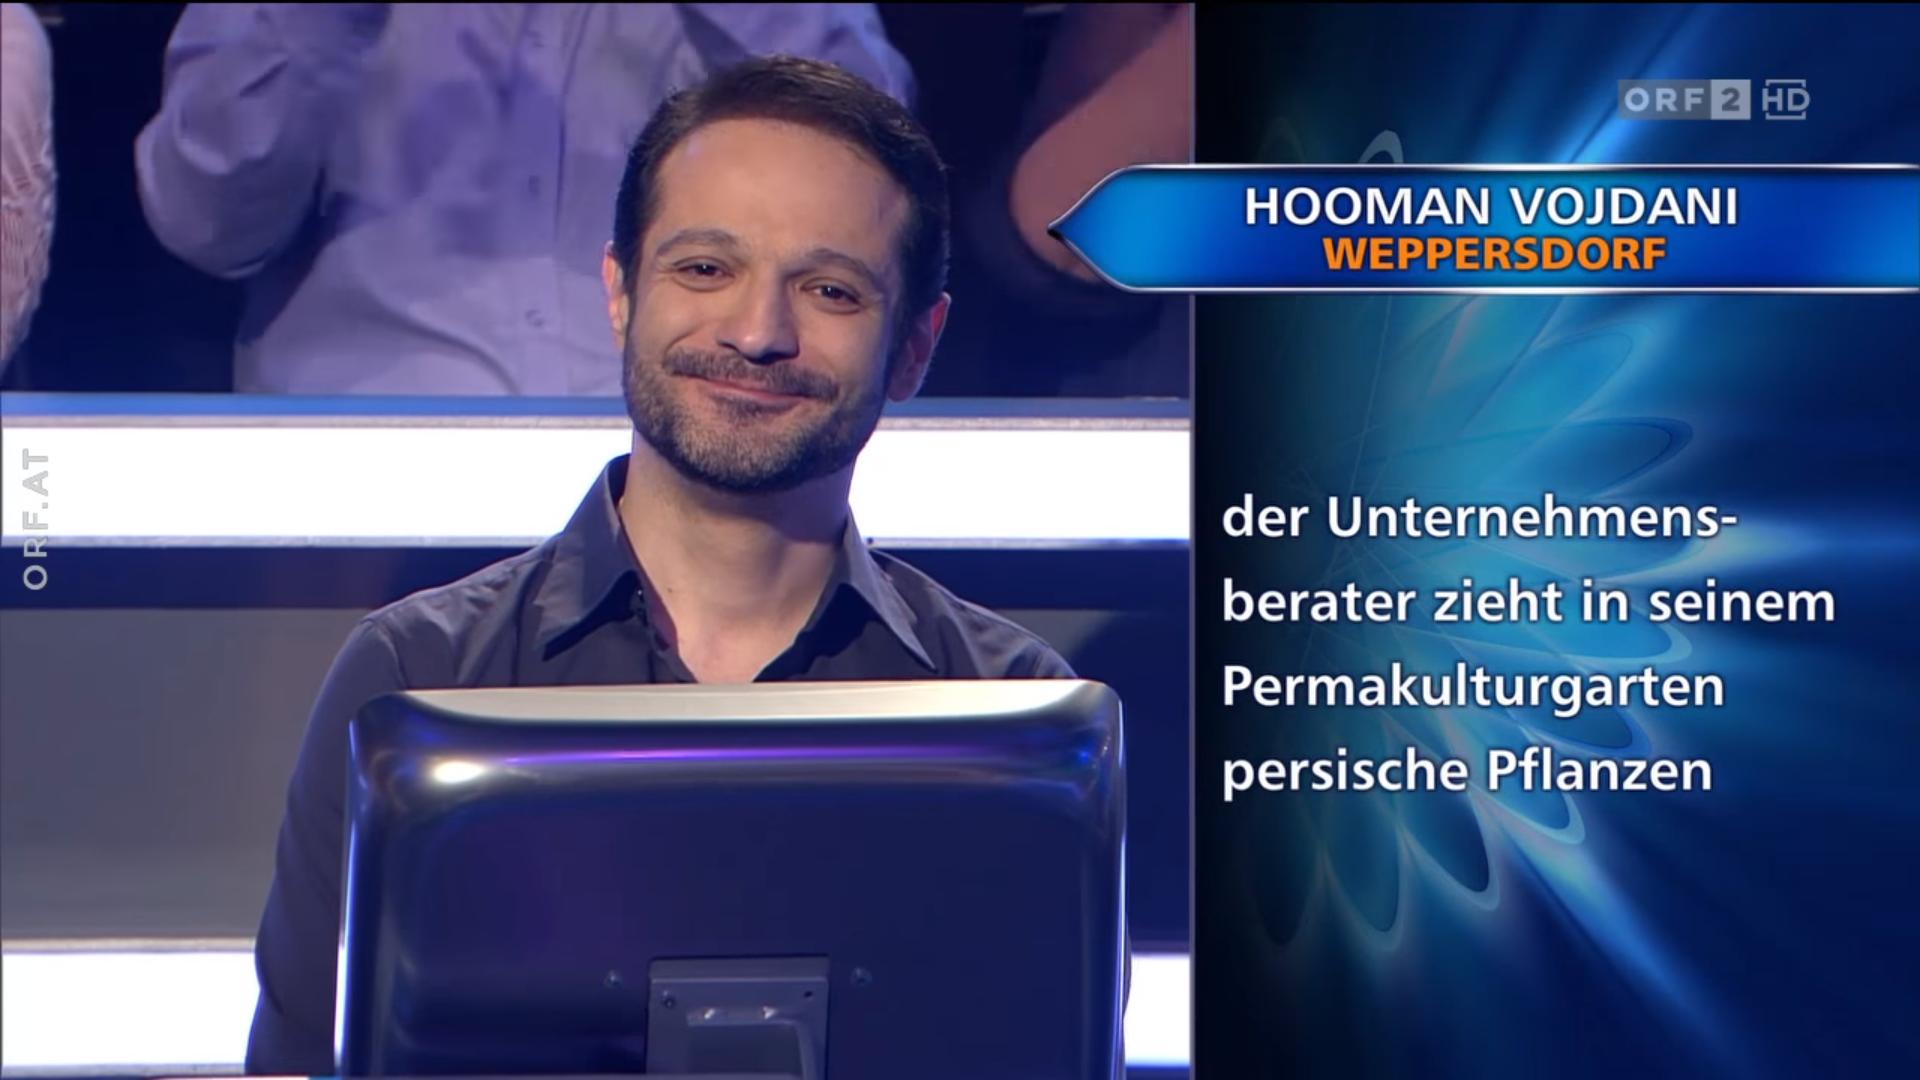 Hooman Vojdani